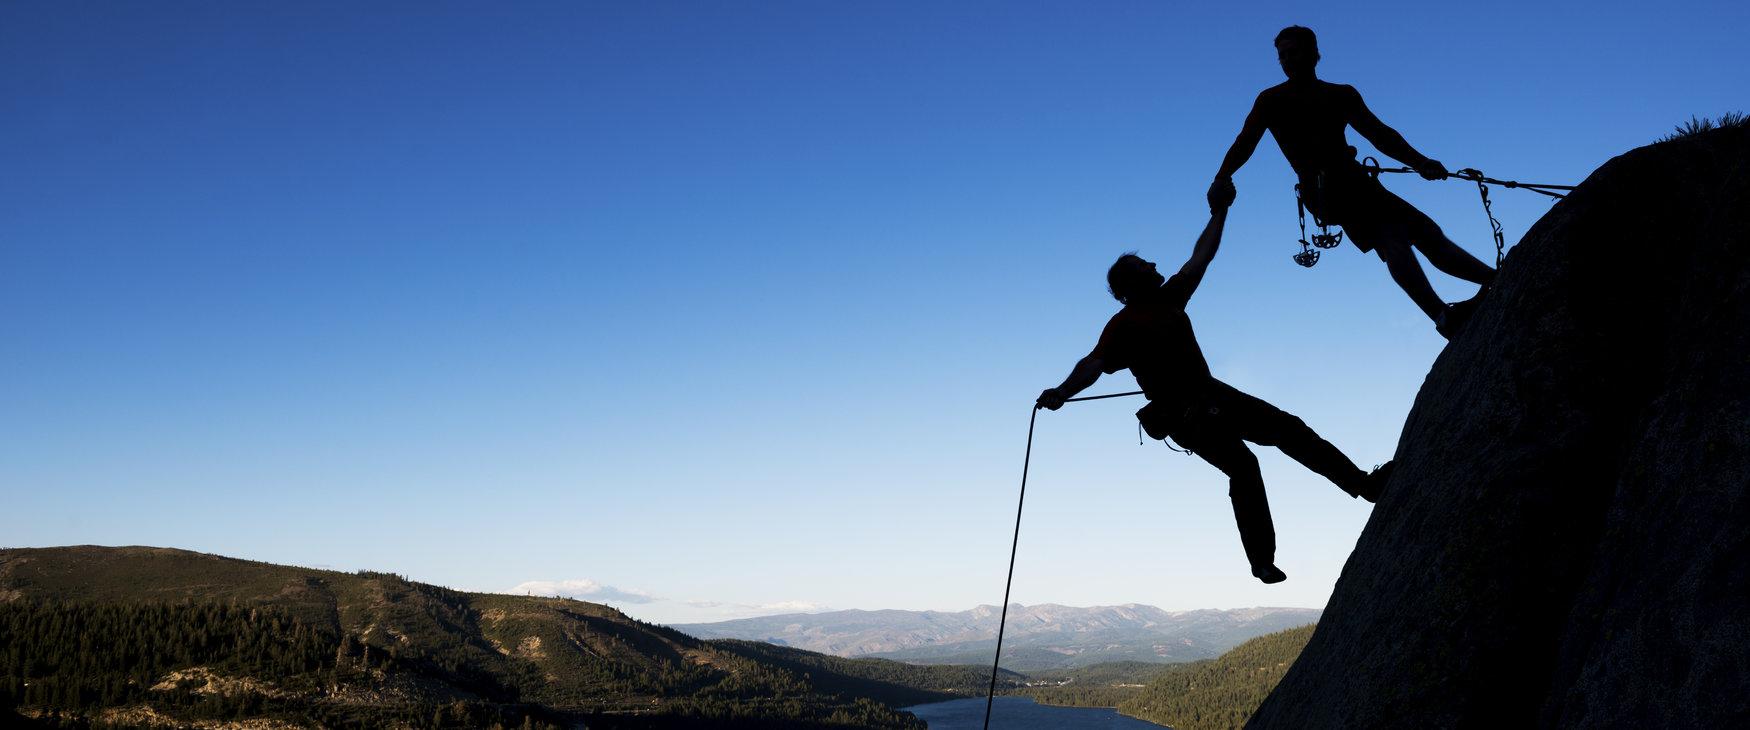 Two climbers climbing the mountain